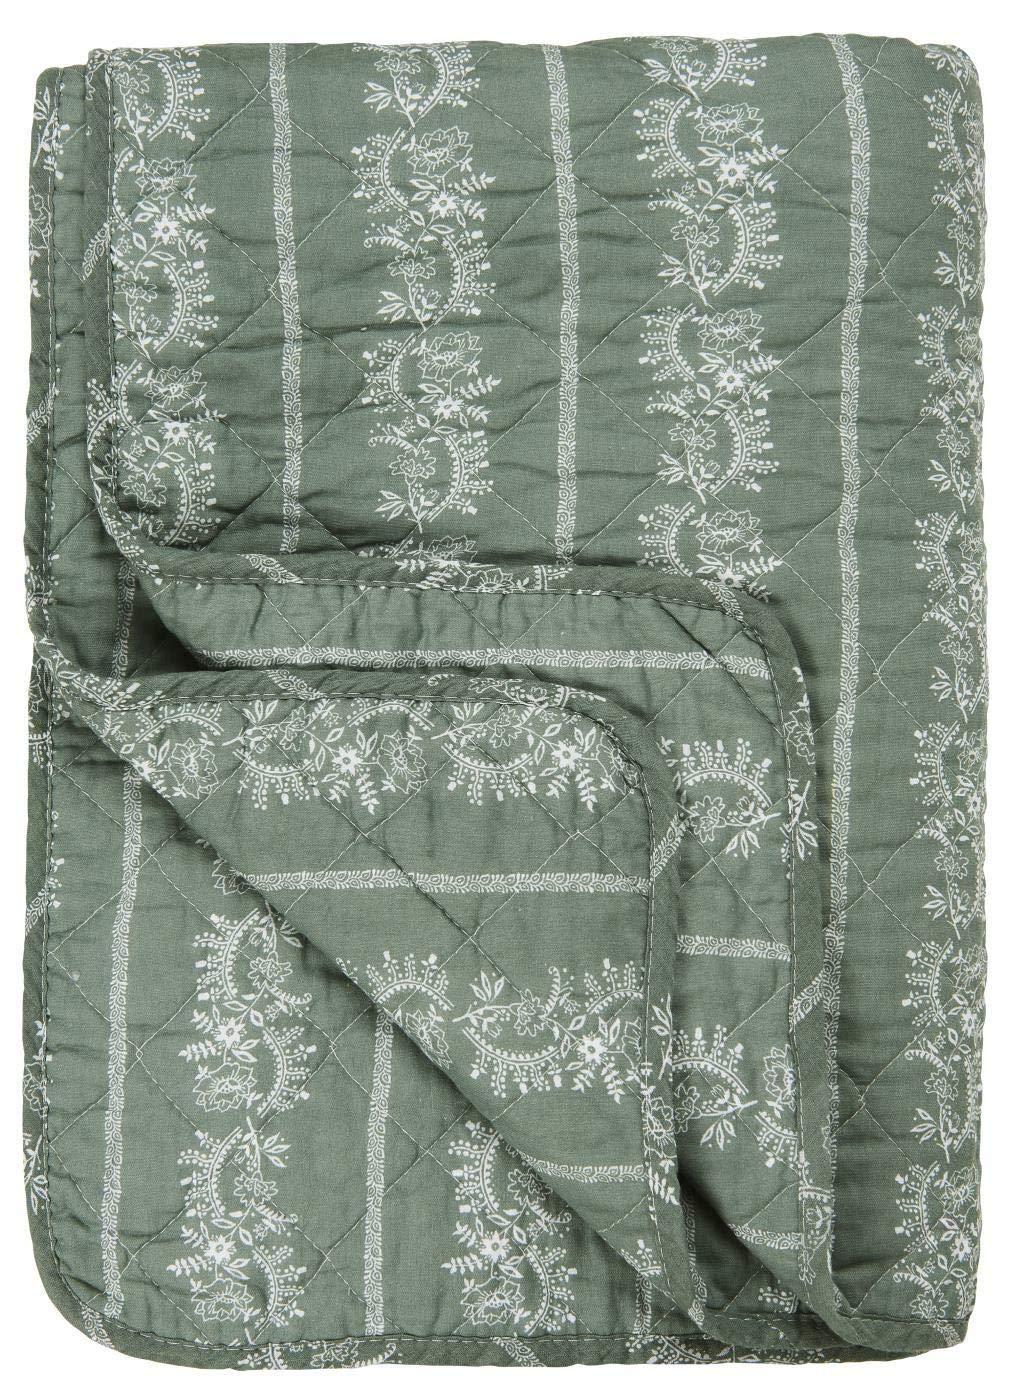 IB Laursen - Quilt - Tagesdecke - staubig grün - Blaumenmuster - 180 x 130 cm